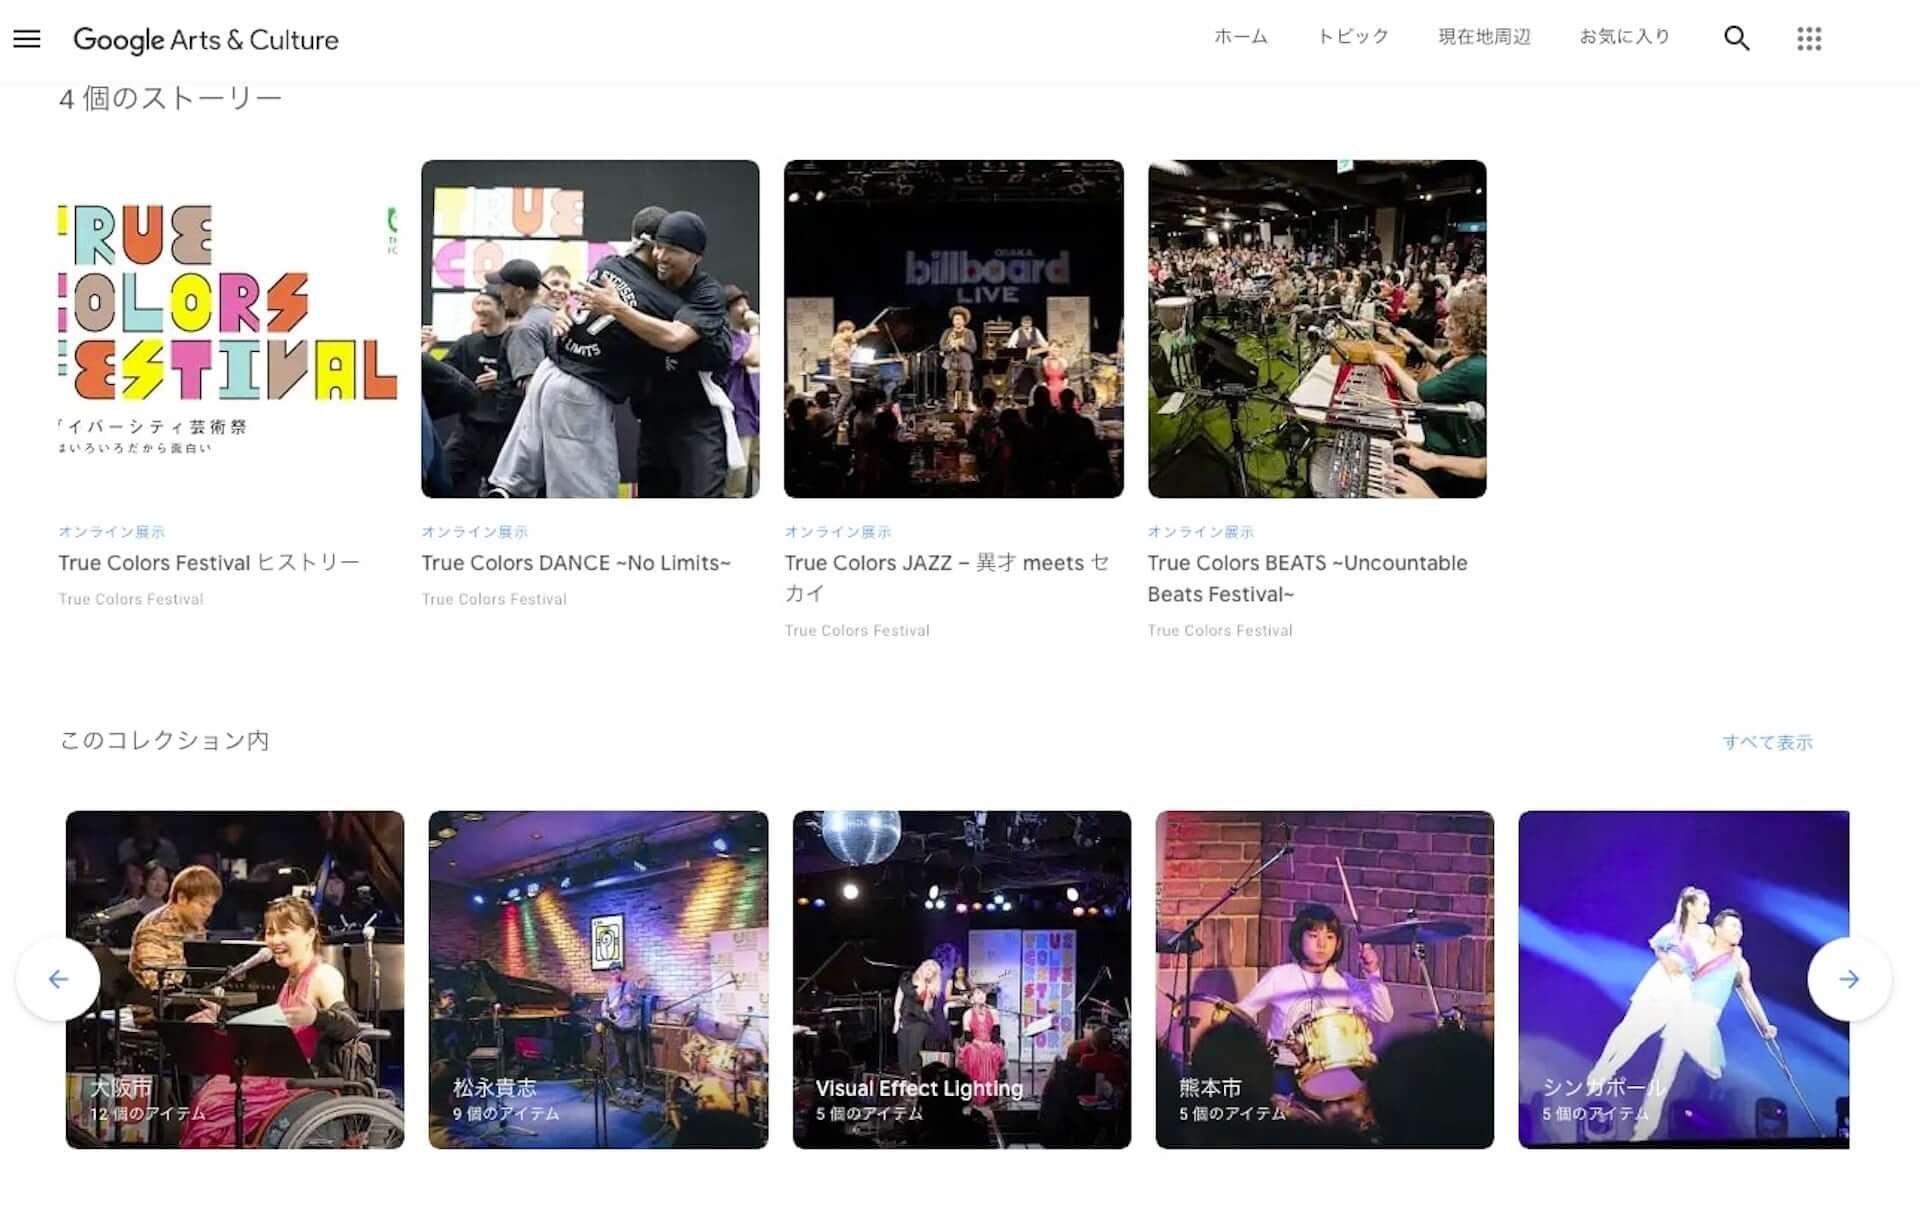 <True Colors Festival -超ダイバーシティ芸術祭->のオンライン展示が開始|ダンスやミュージカルなどの記録映像が公開 art200521_truecolors_fes_5-1920x1227